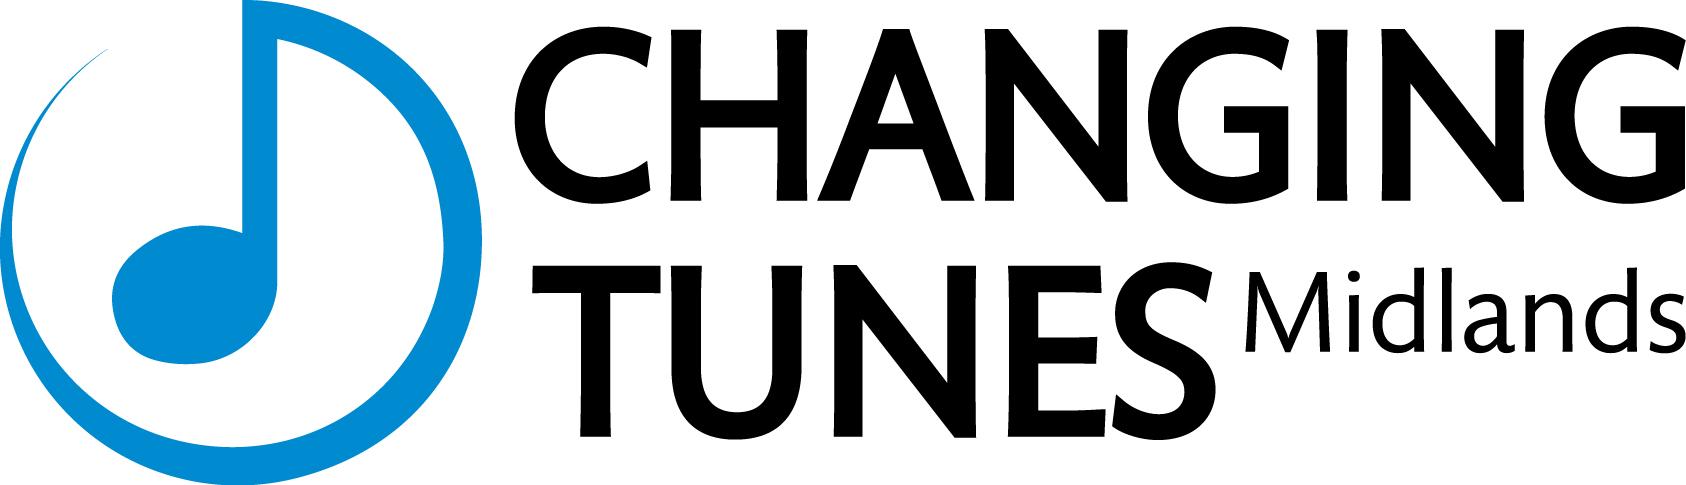 Changing Tunes Midl&s Ltd